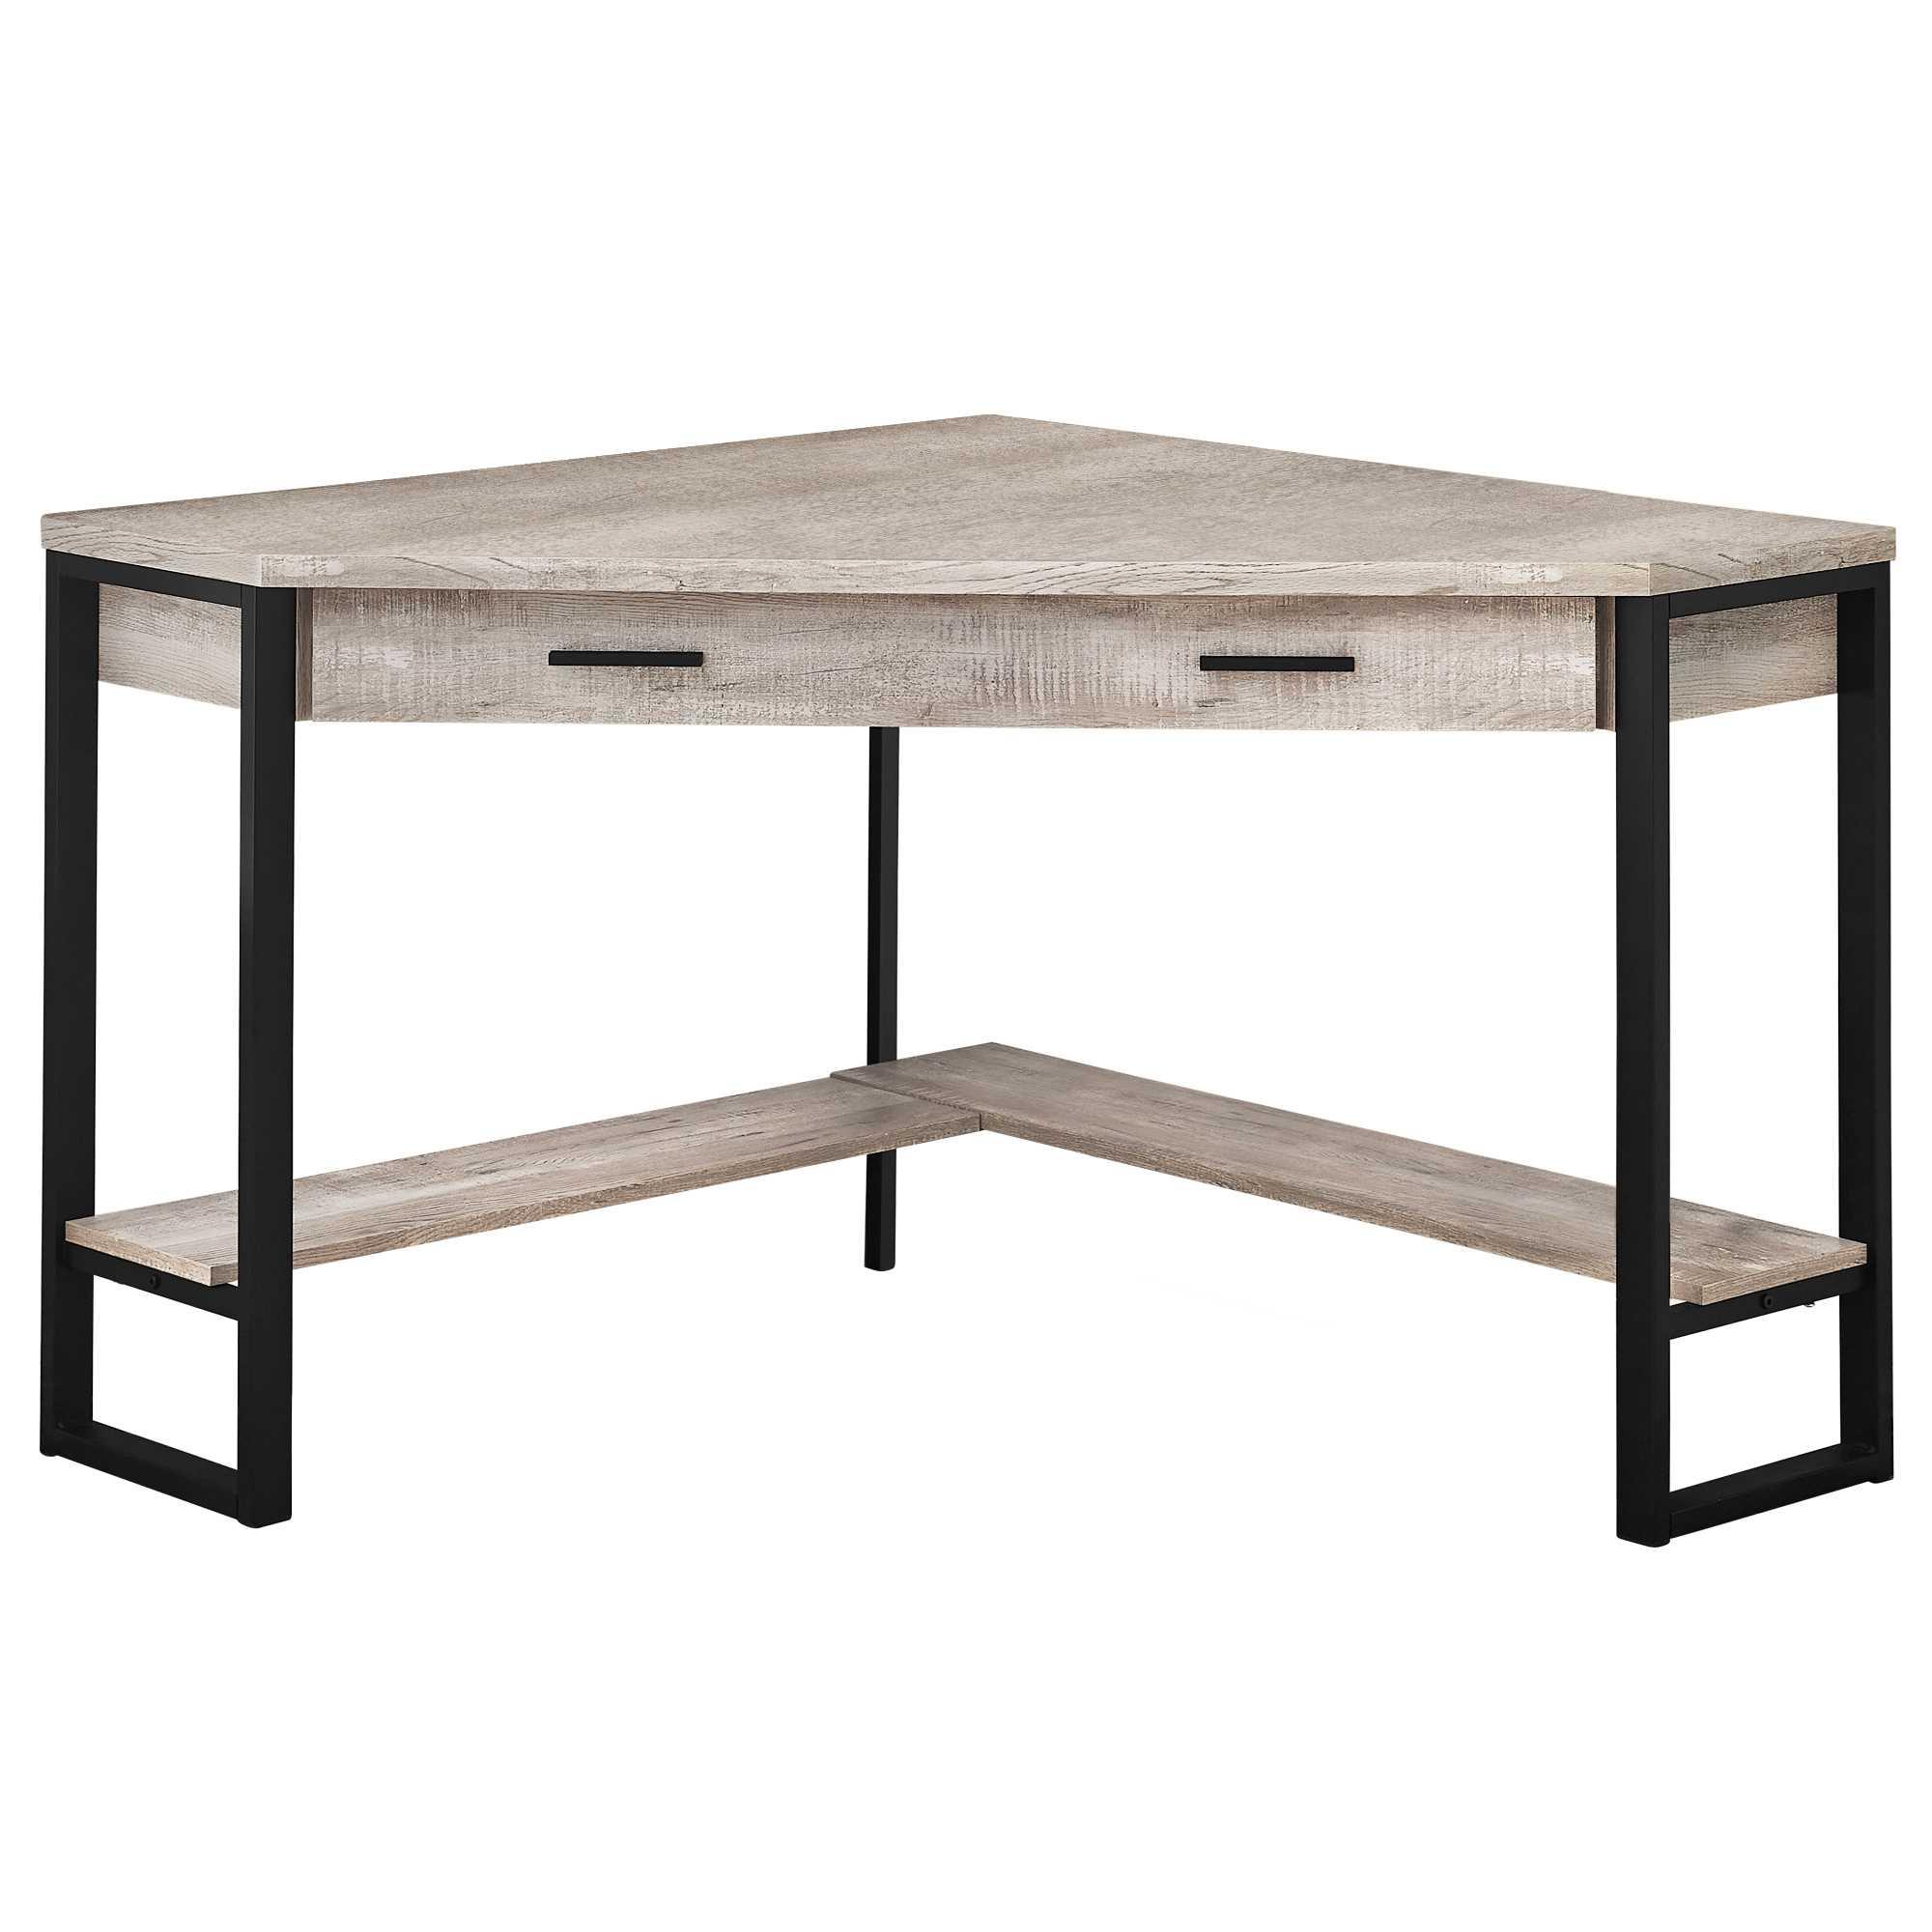 "42"" x 42"" x 30"" Taupe  Reclaimed Wood Corner  Computer Desk"